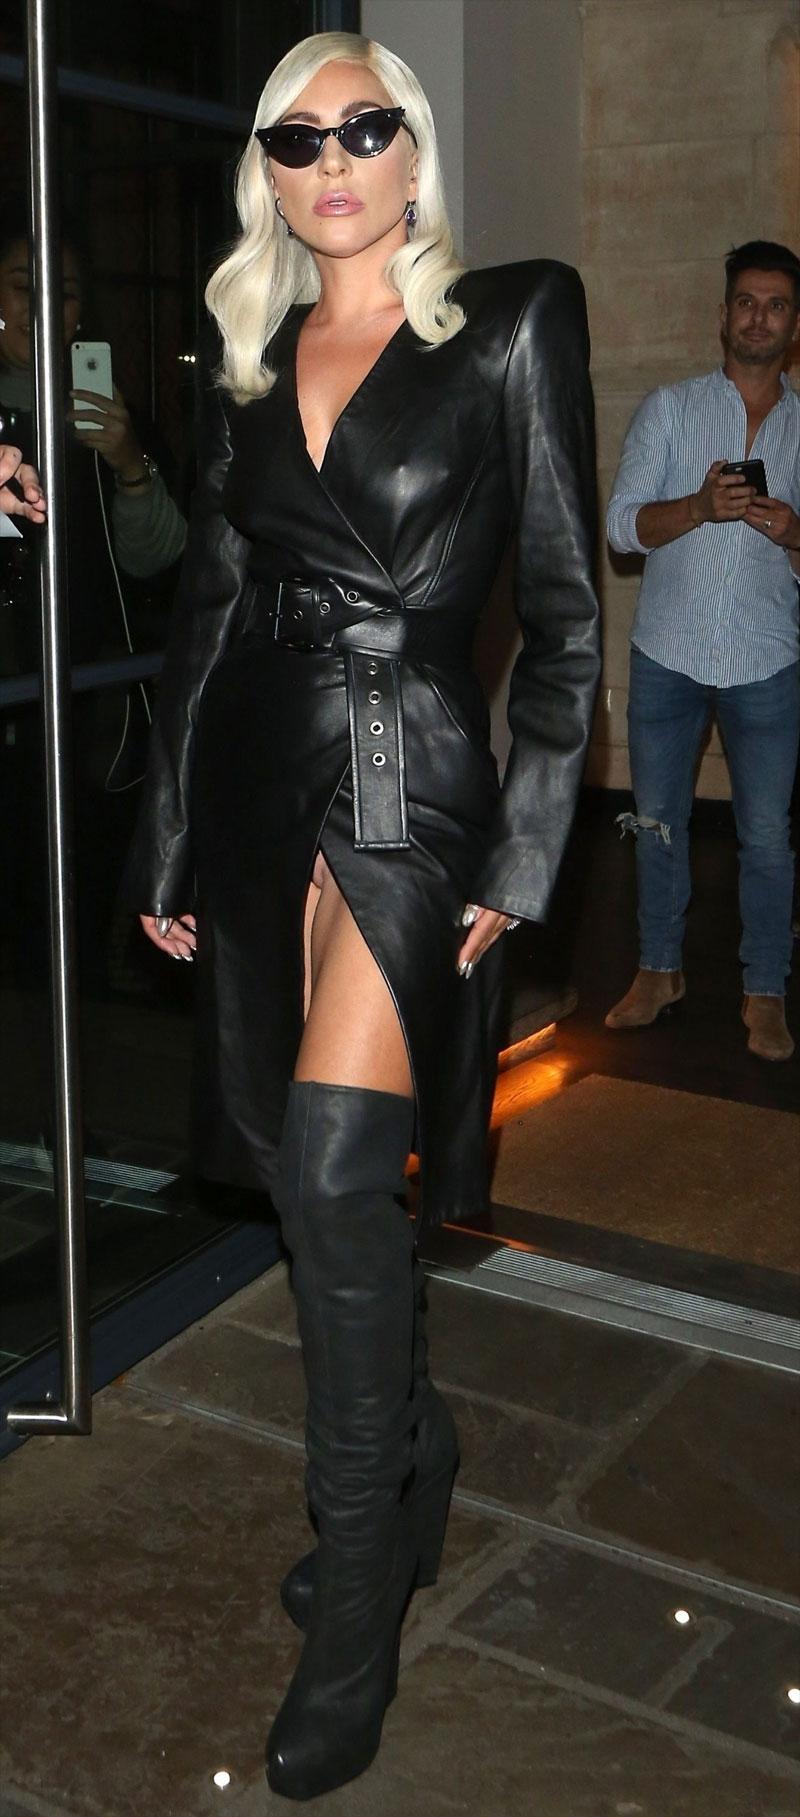 Lady Gaga No Panties Peek Up her Leather Skirt